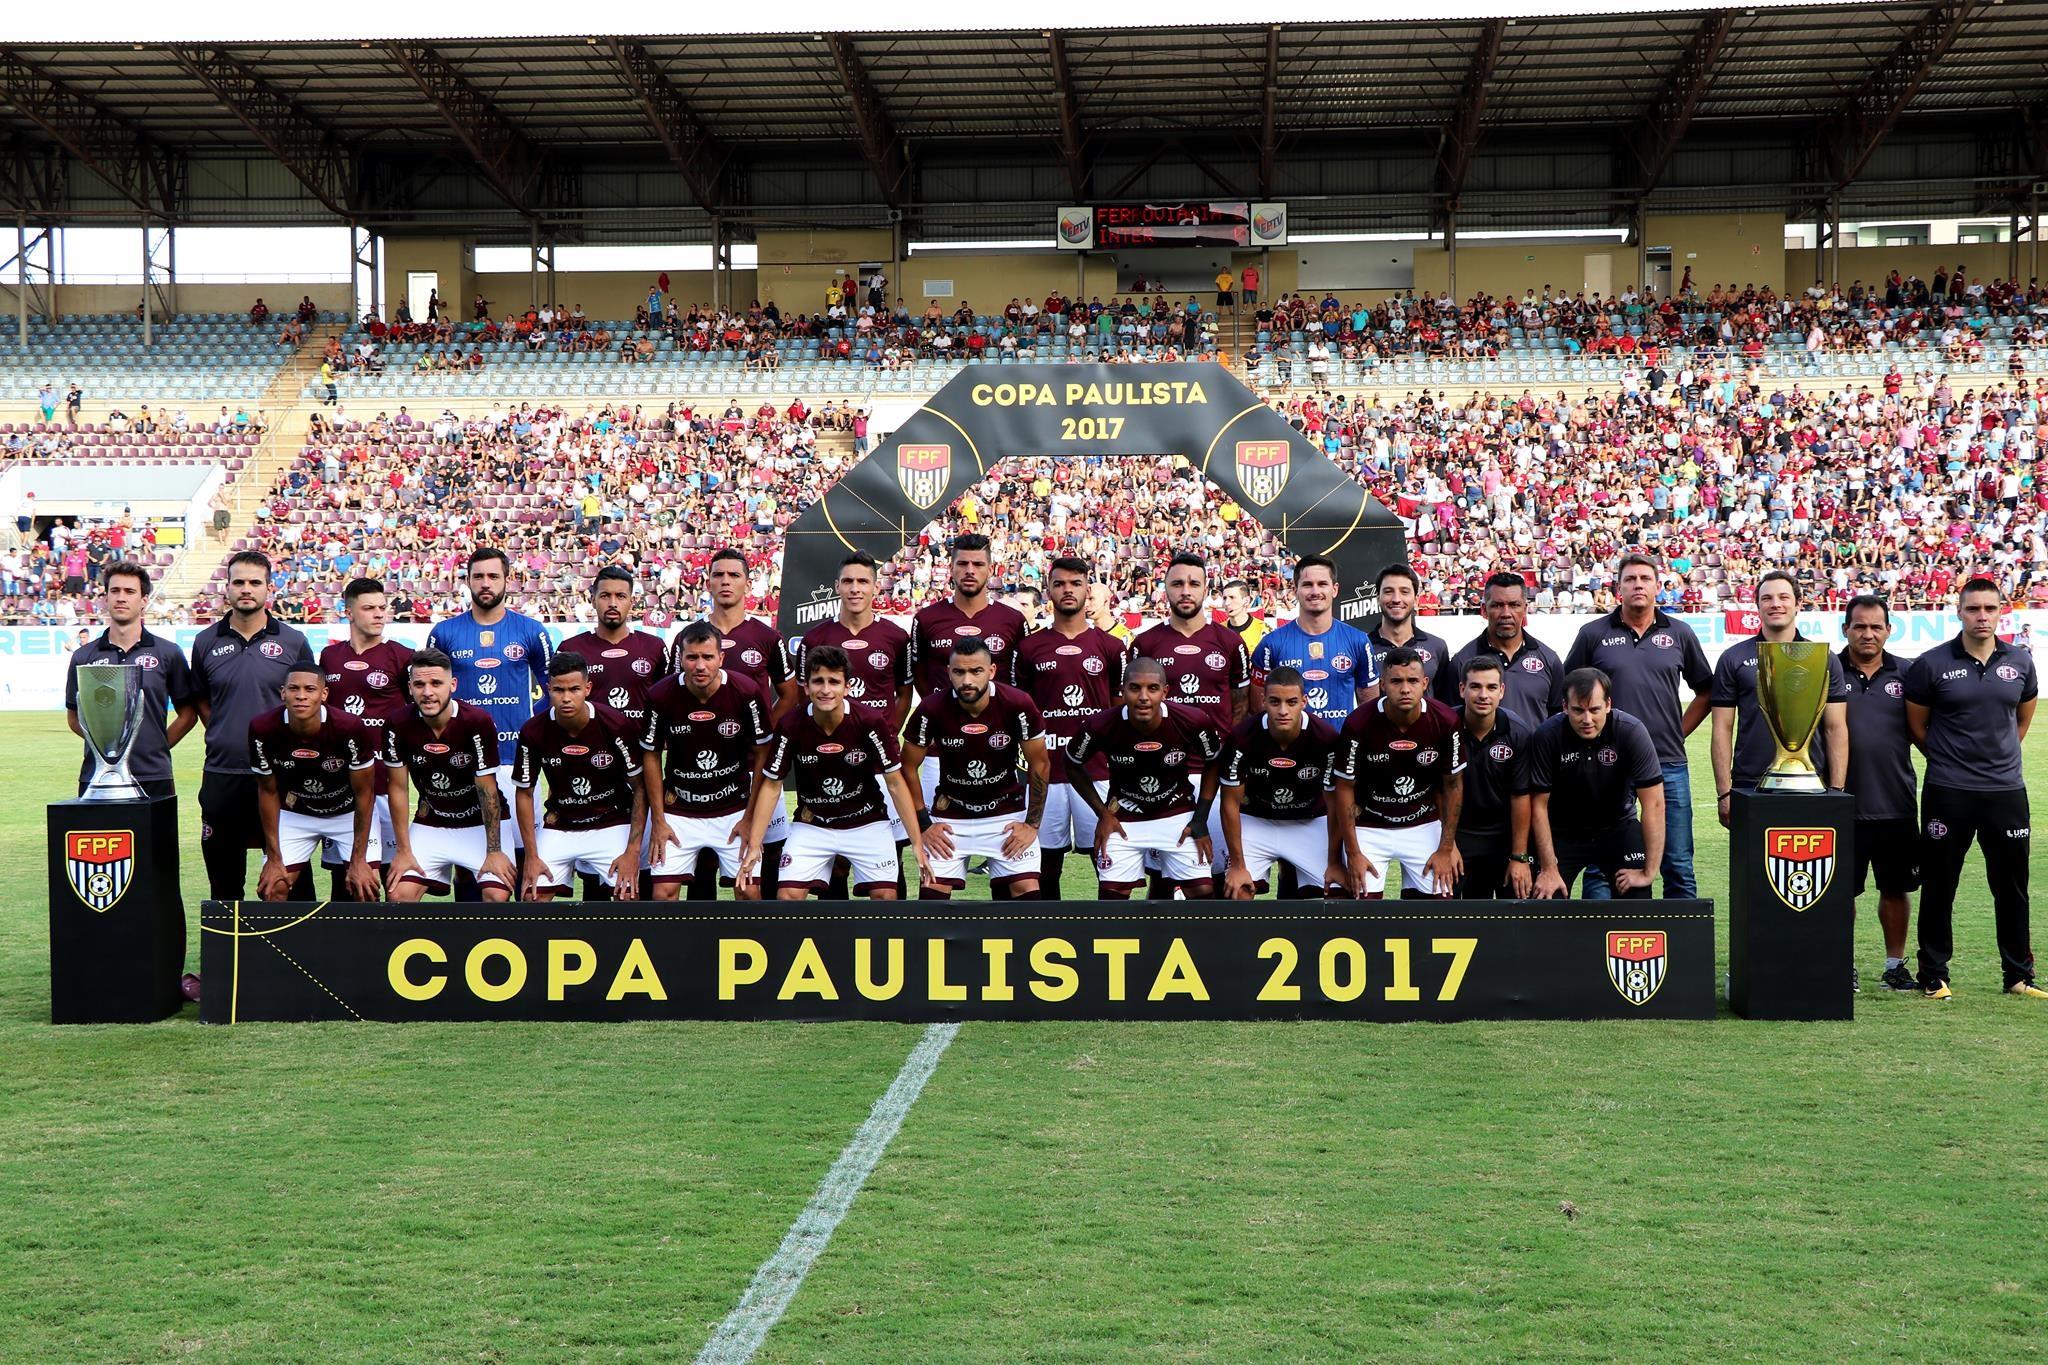 Ferroviária won the Copa Paulista 2017